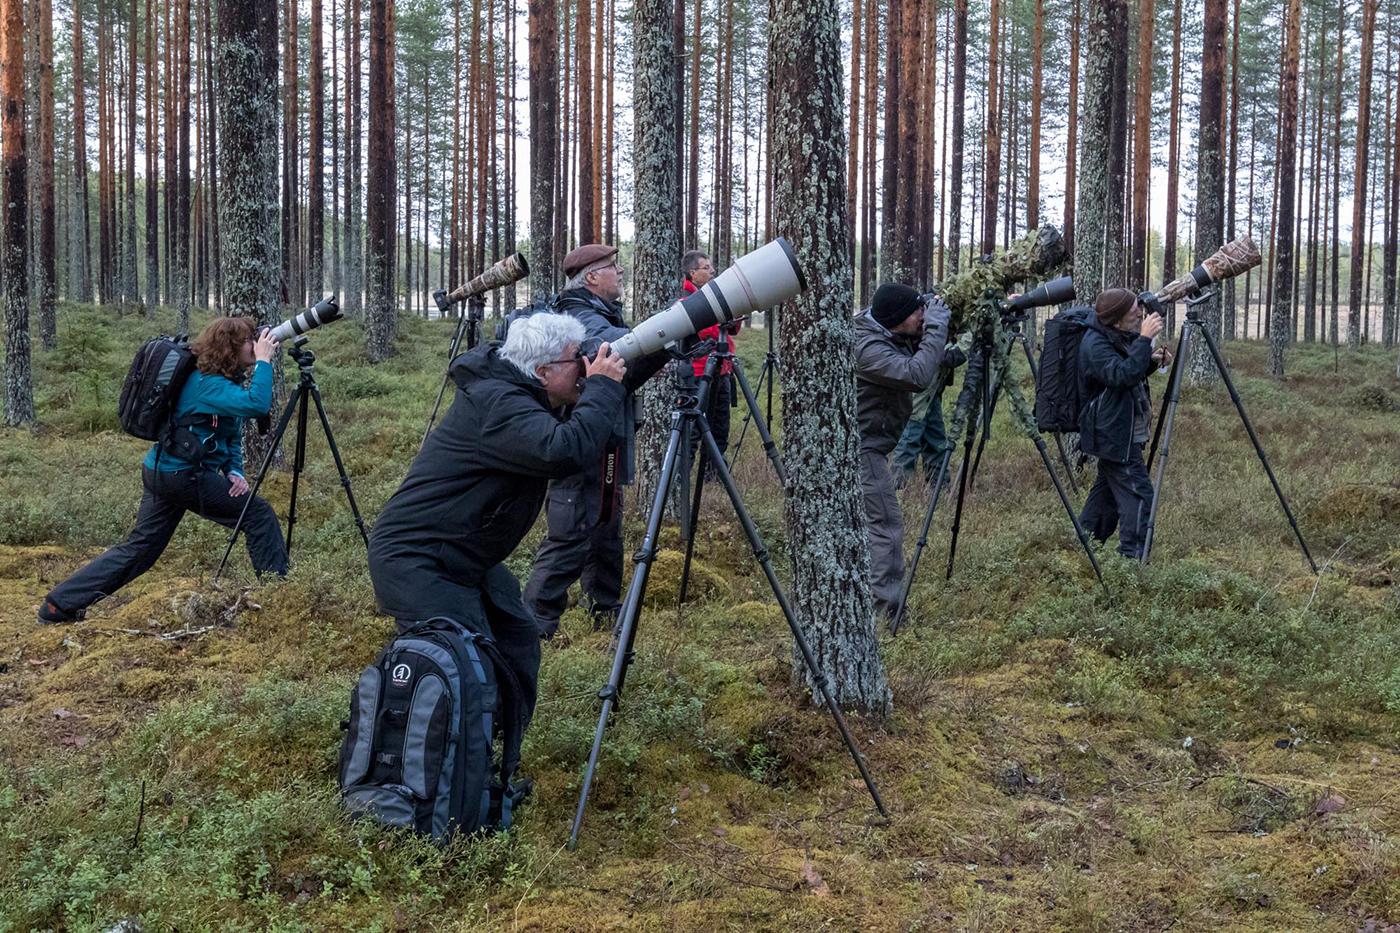 zb_Finnland_Fotoreise.jpg